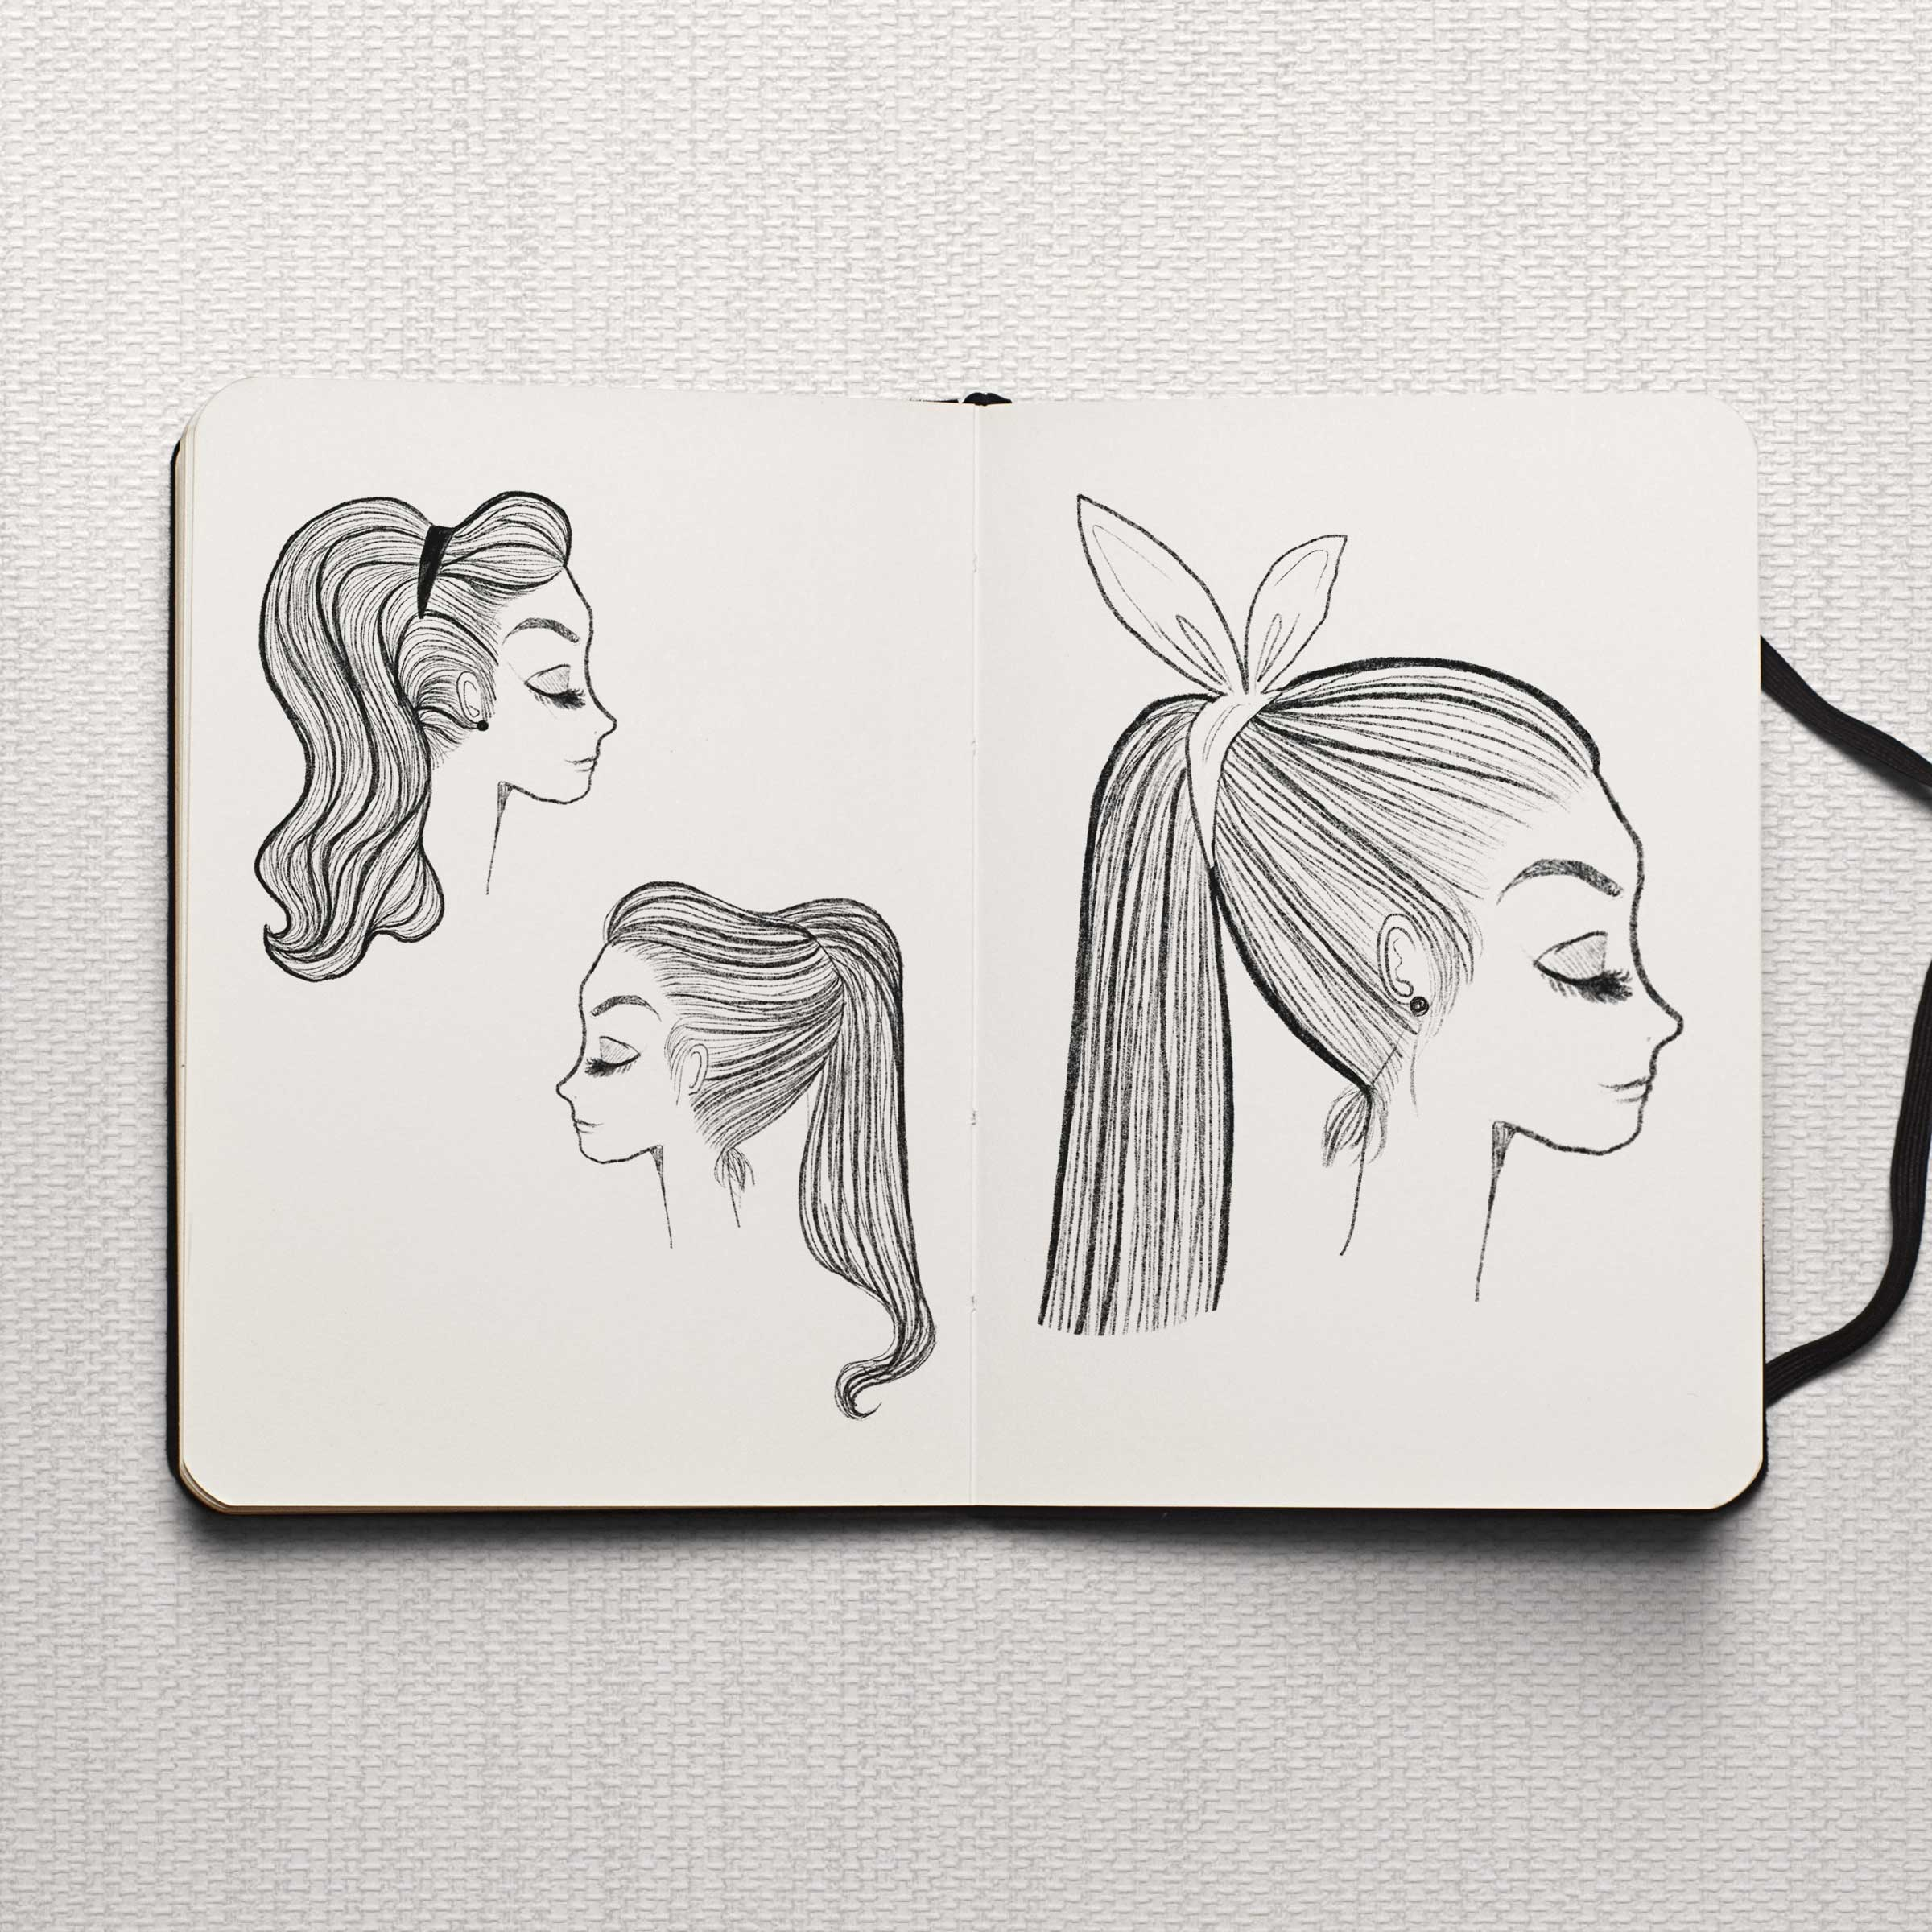 Studio Maarit - Sketchbook -   Fashion Illustration - Black & White